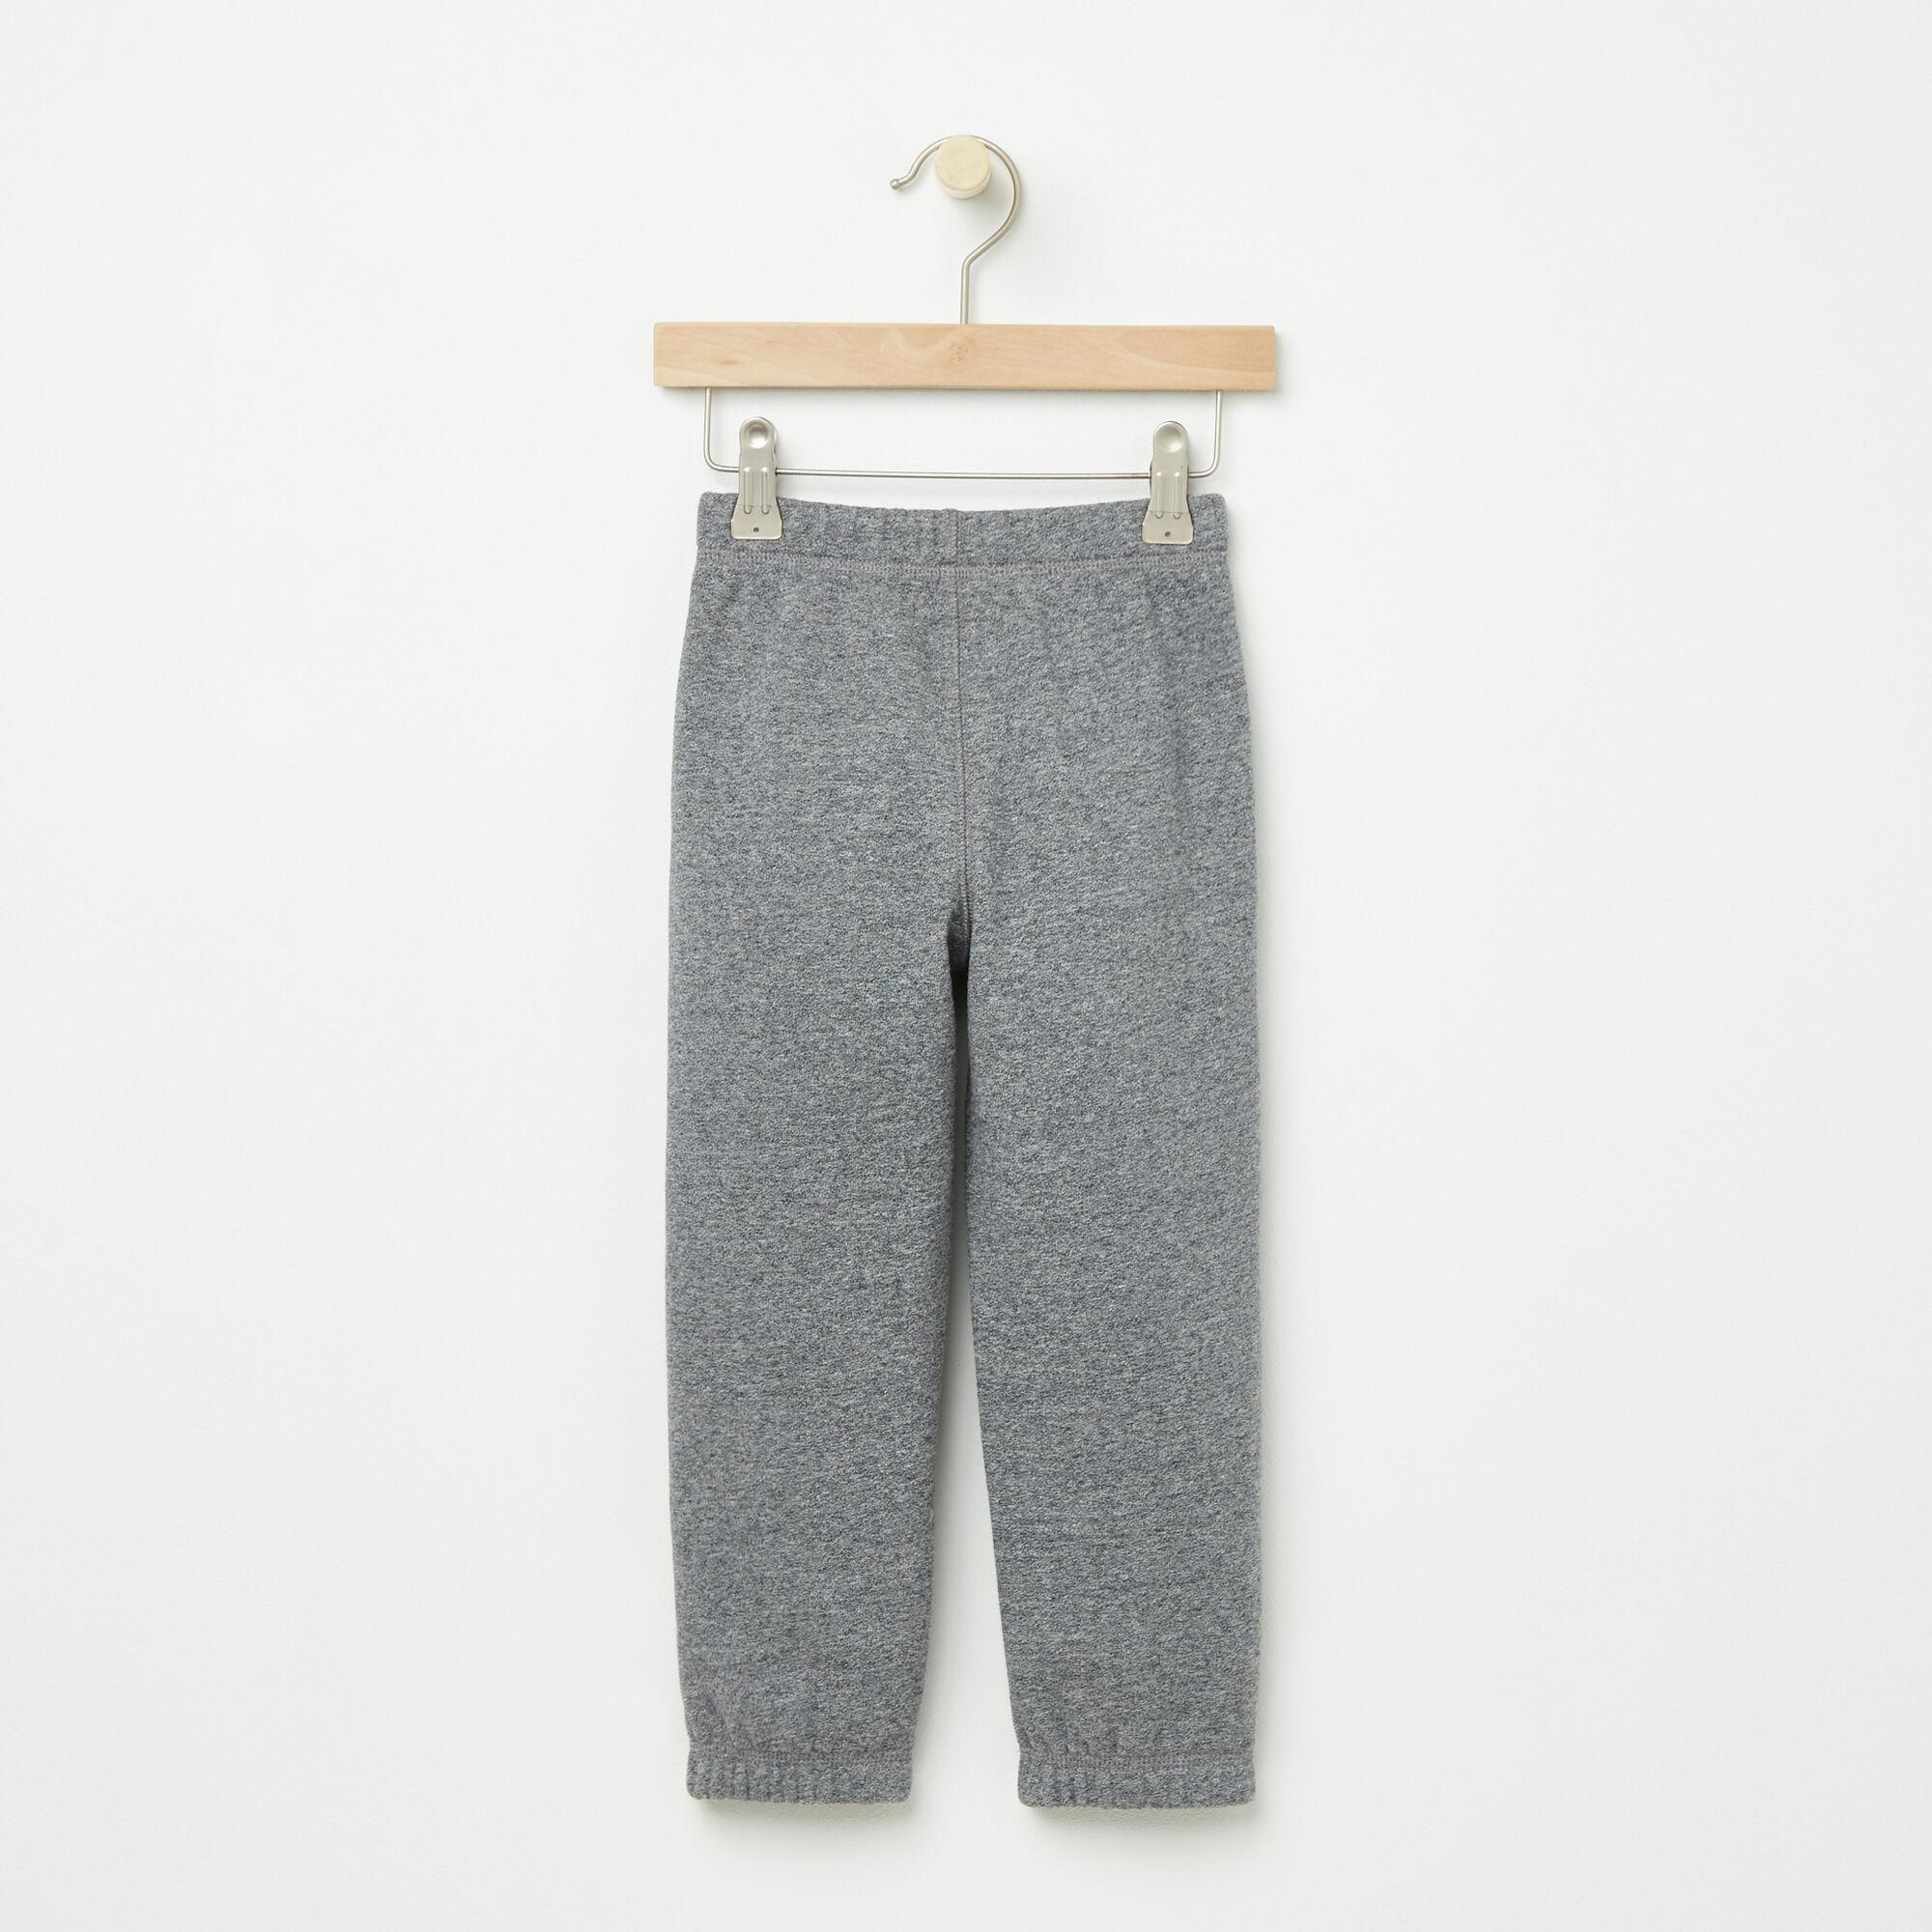 Tout-Petits Pantalon Coton Ouaté Original